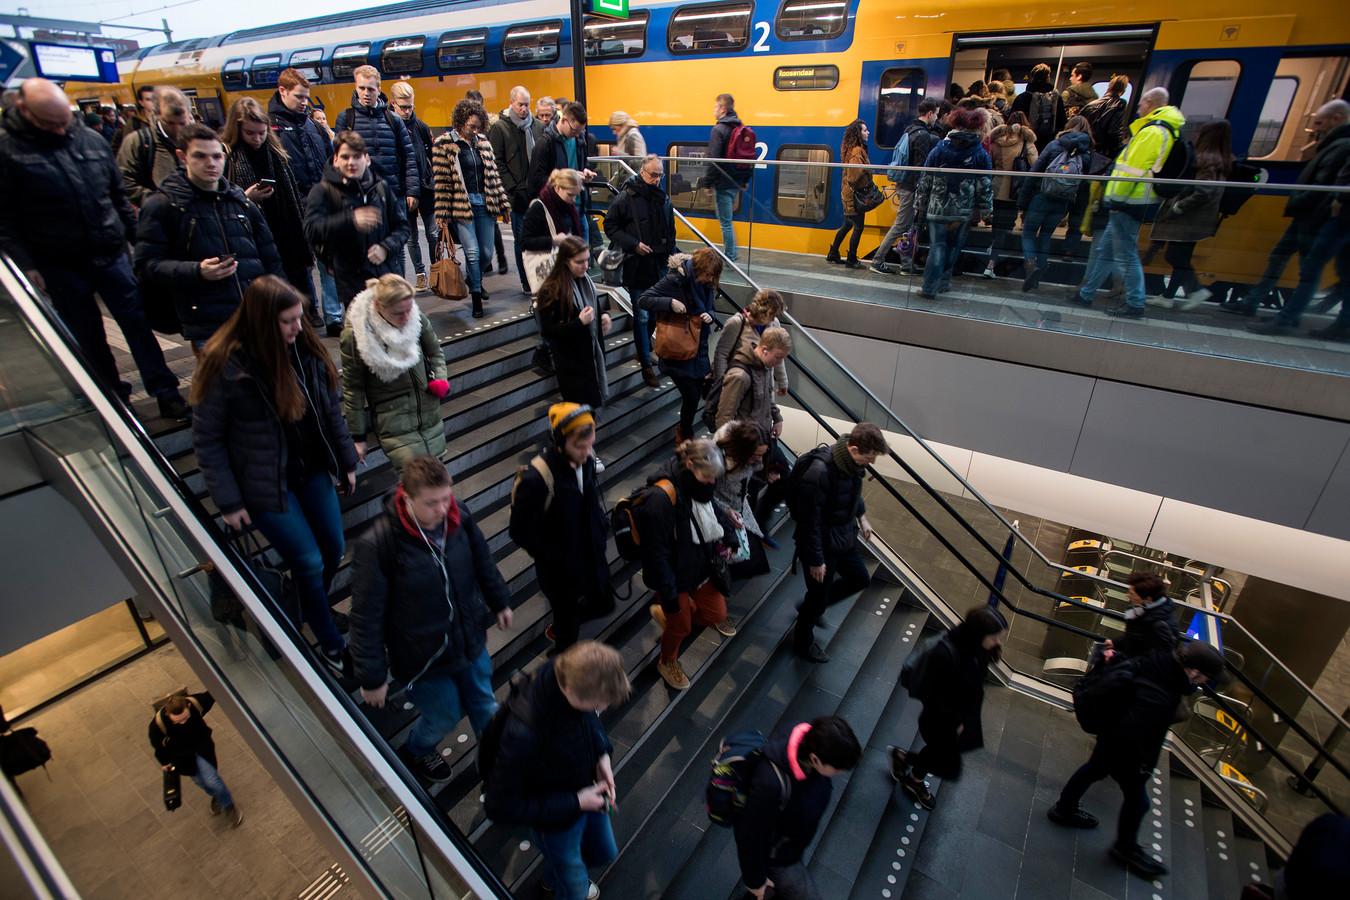 Drukte op het station van Tilburg.